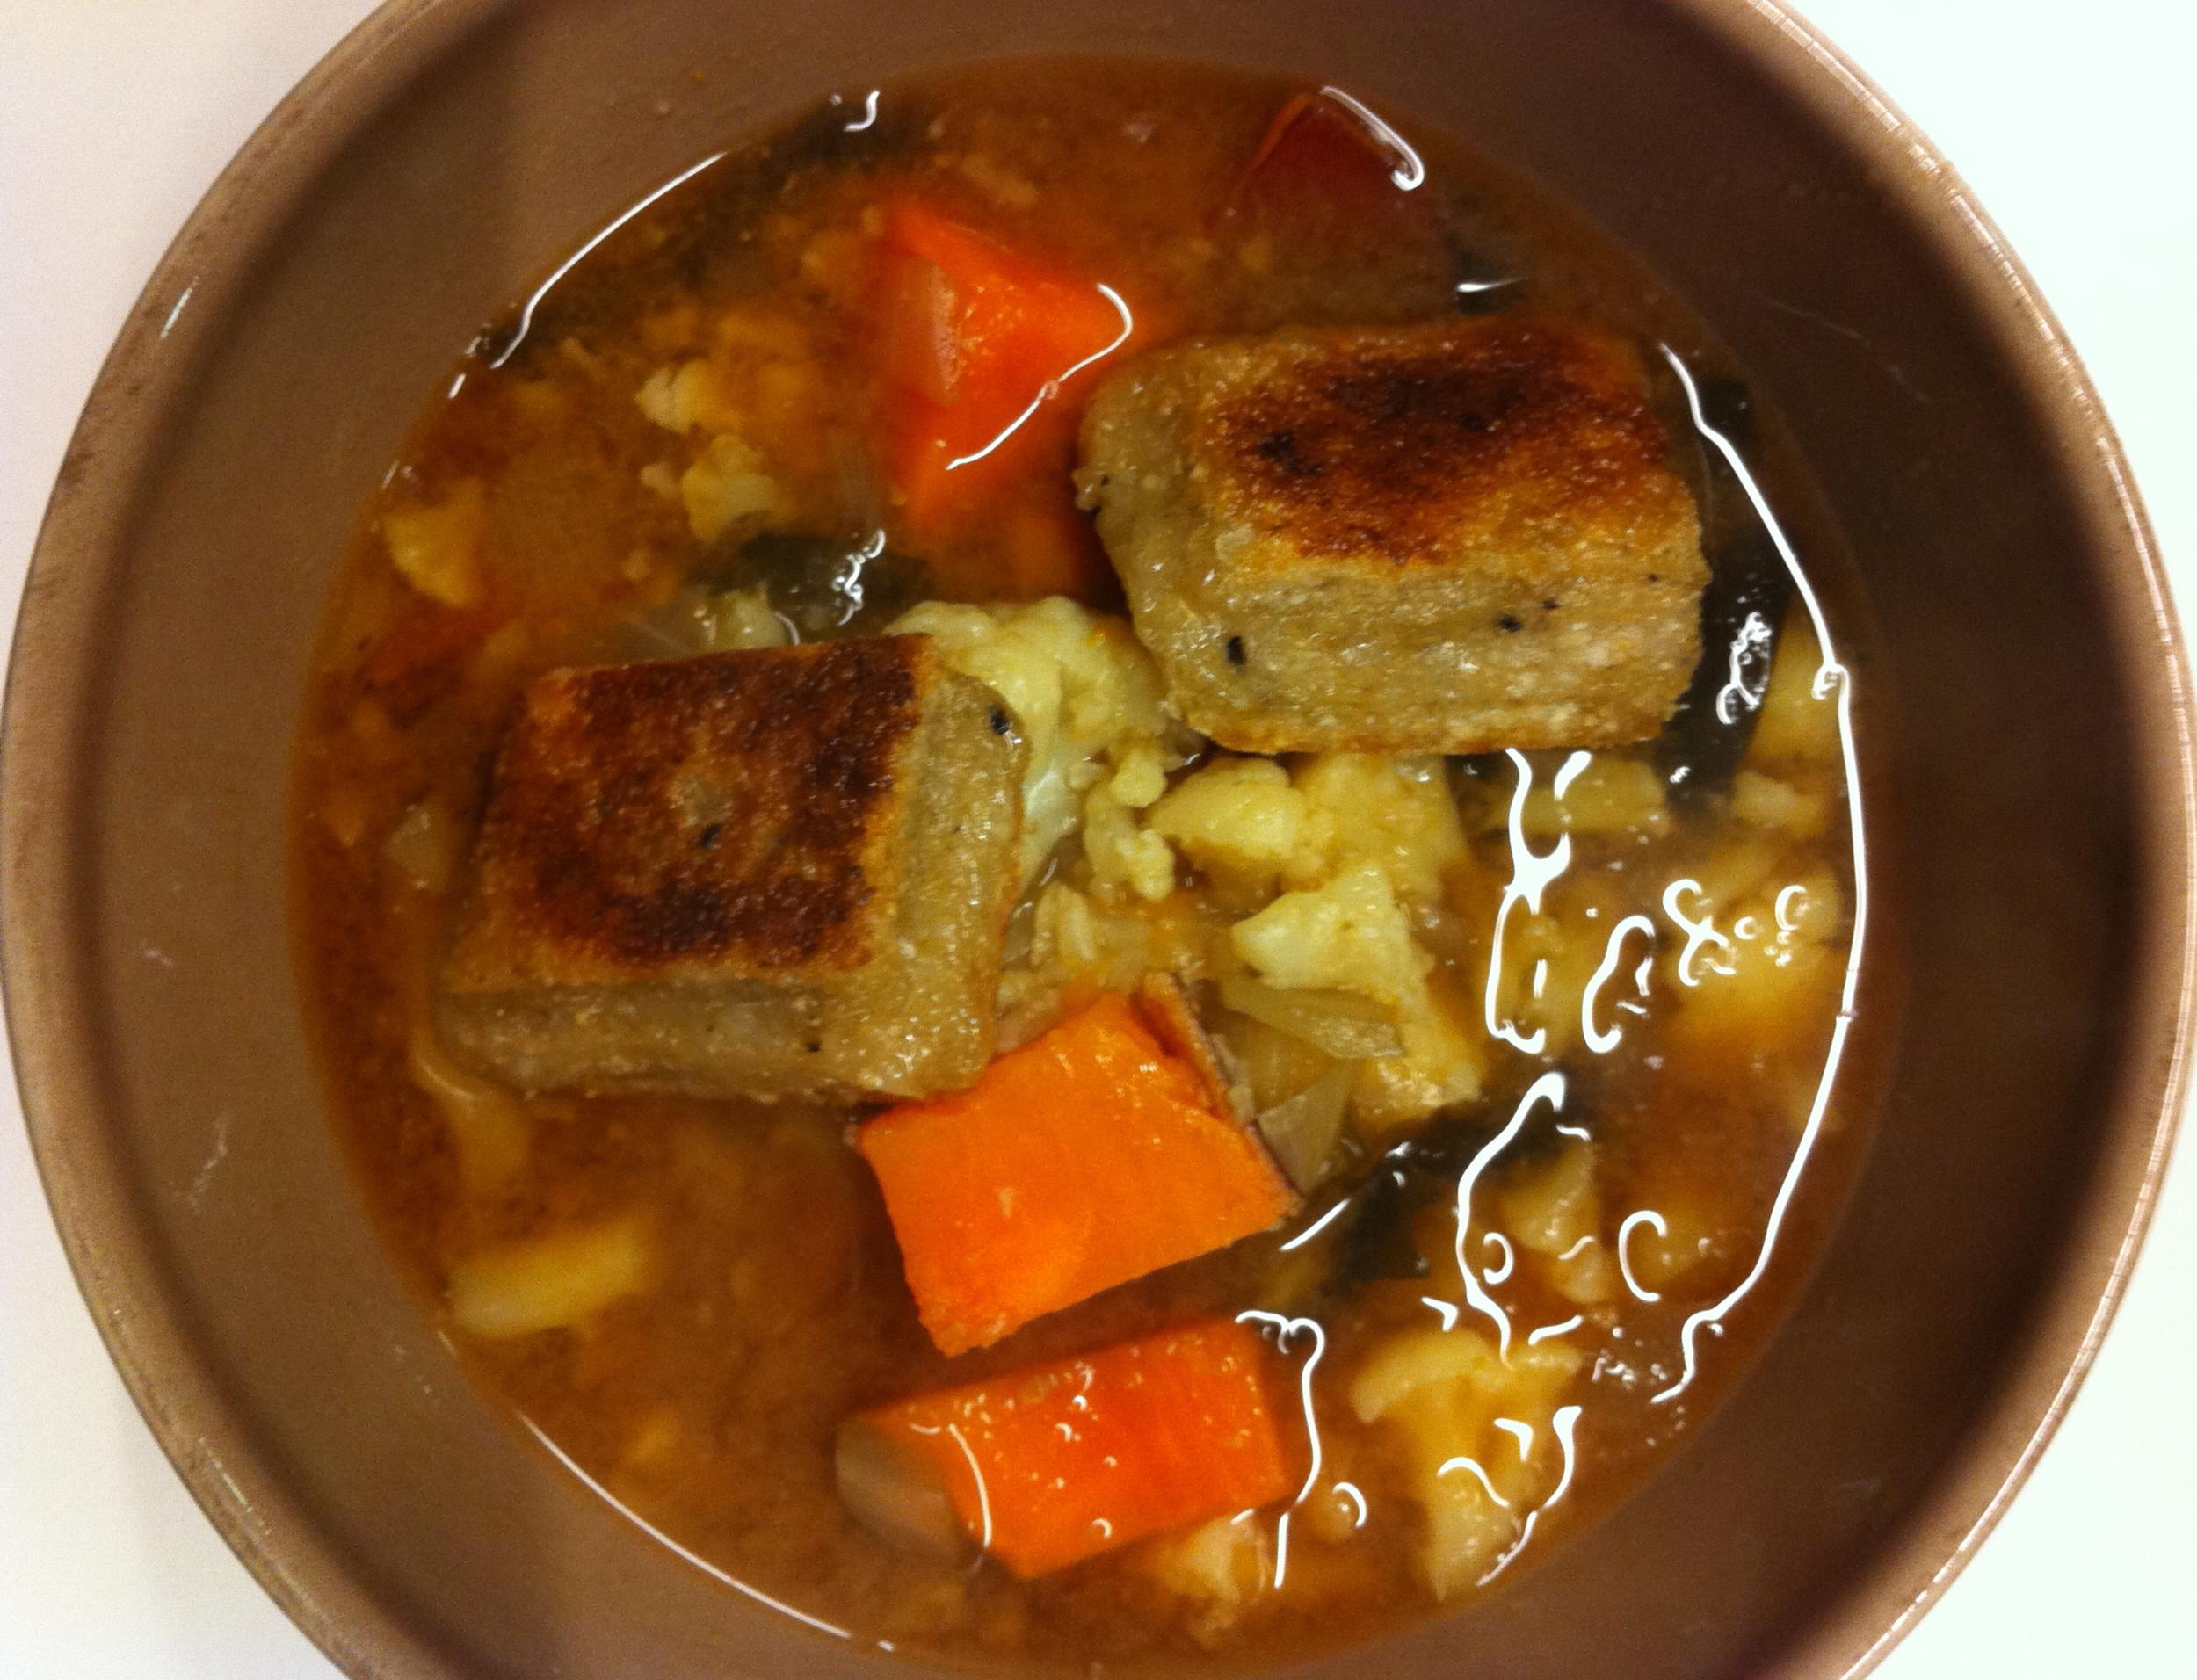 I love miso soup.